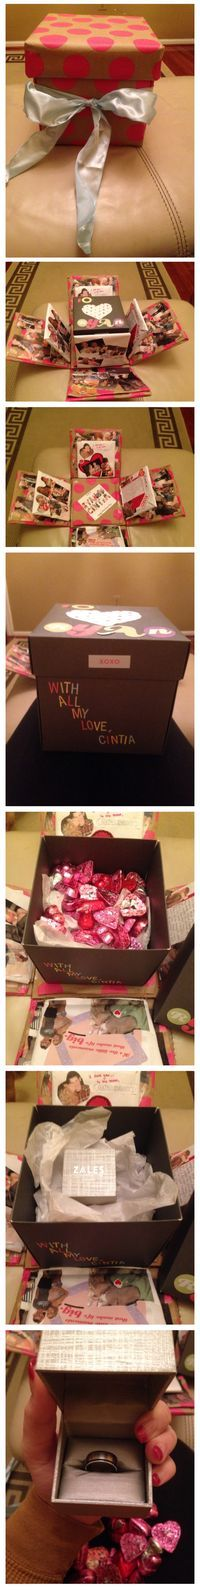 Explosion Box for my boyfriend for Valentine's Day